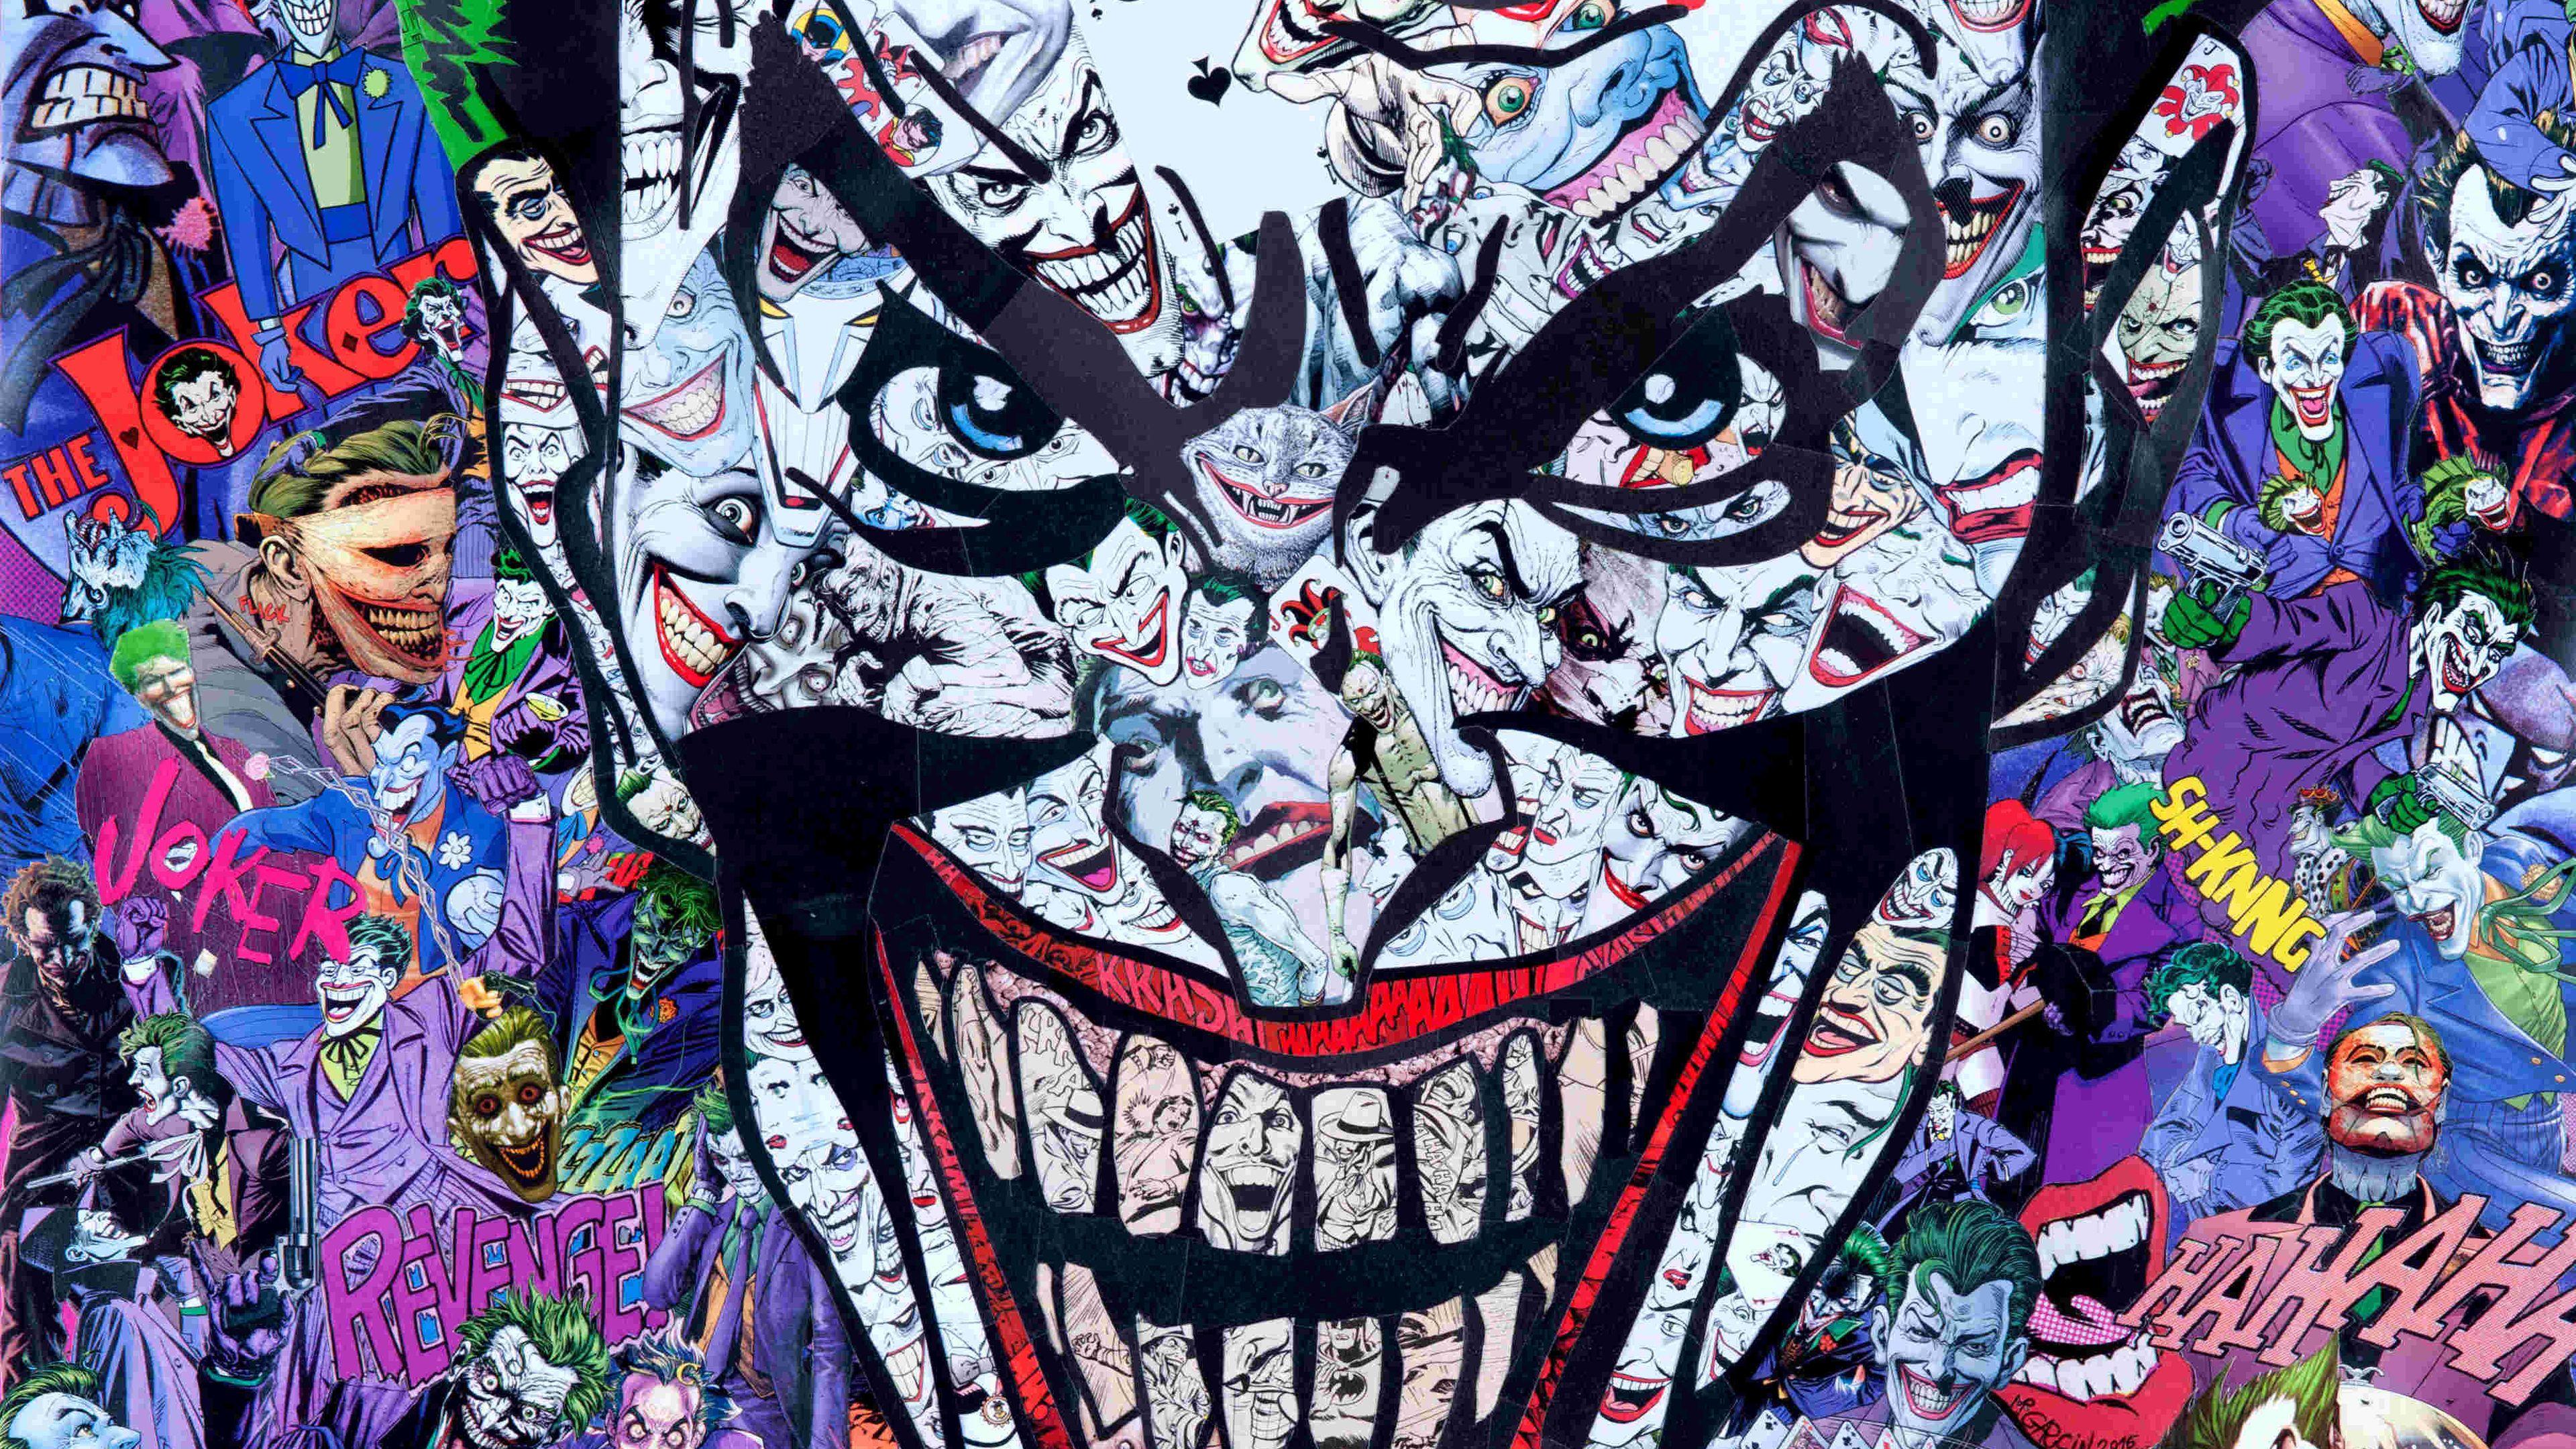 Joker Hahaha 4k Superheroes Wallpapers Joker Wallpapers Hd Wallpapers Digital Art Wallpapers Art Joker Wallpapers Joker Iphone Wallpaper Joker Hd Wallpaper Graffiti joker joker haha wallpaper